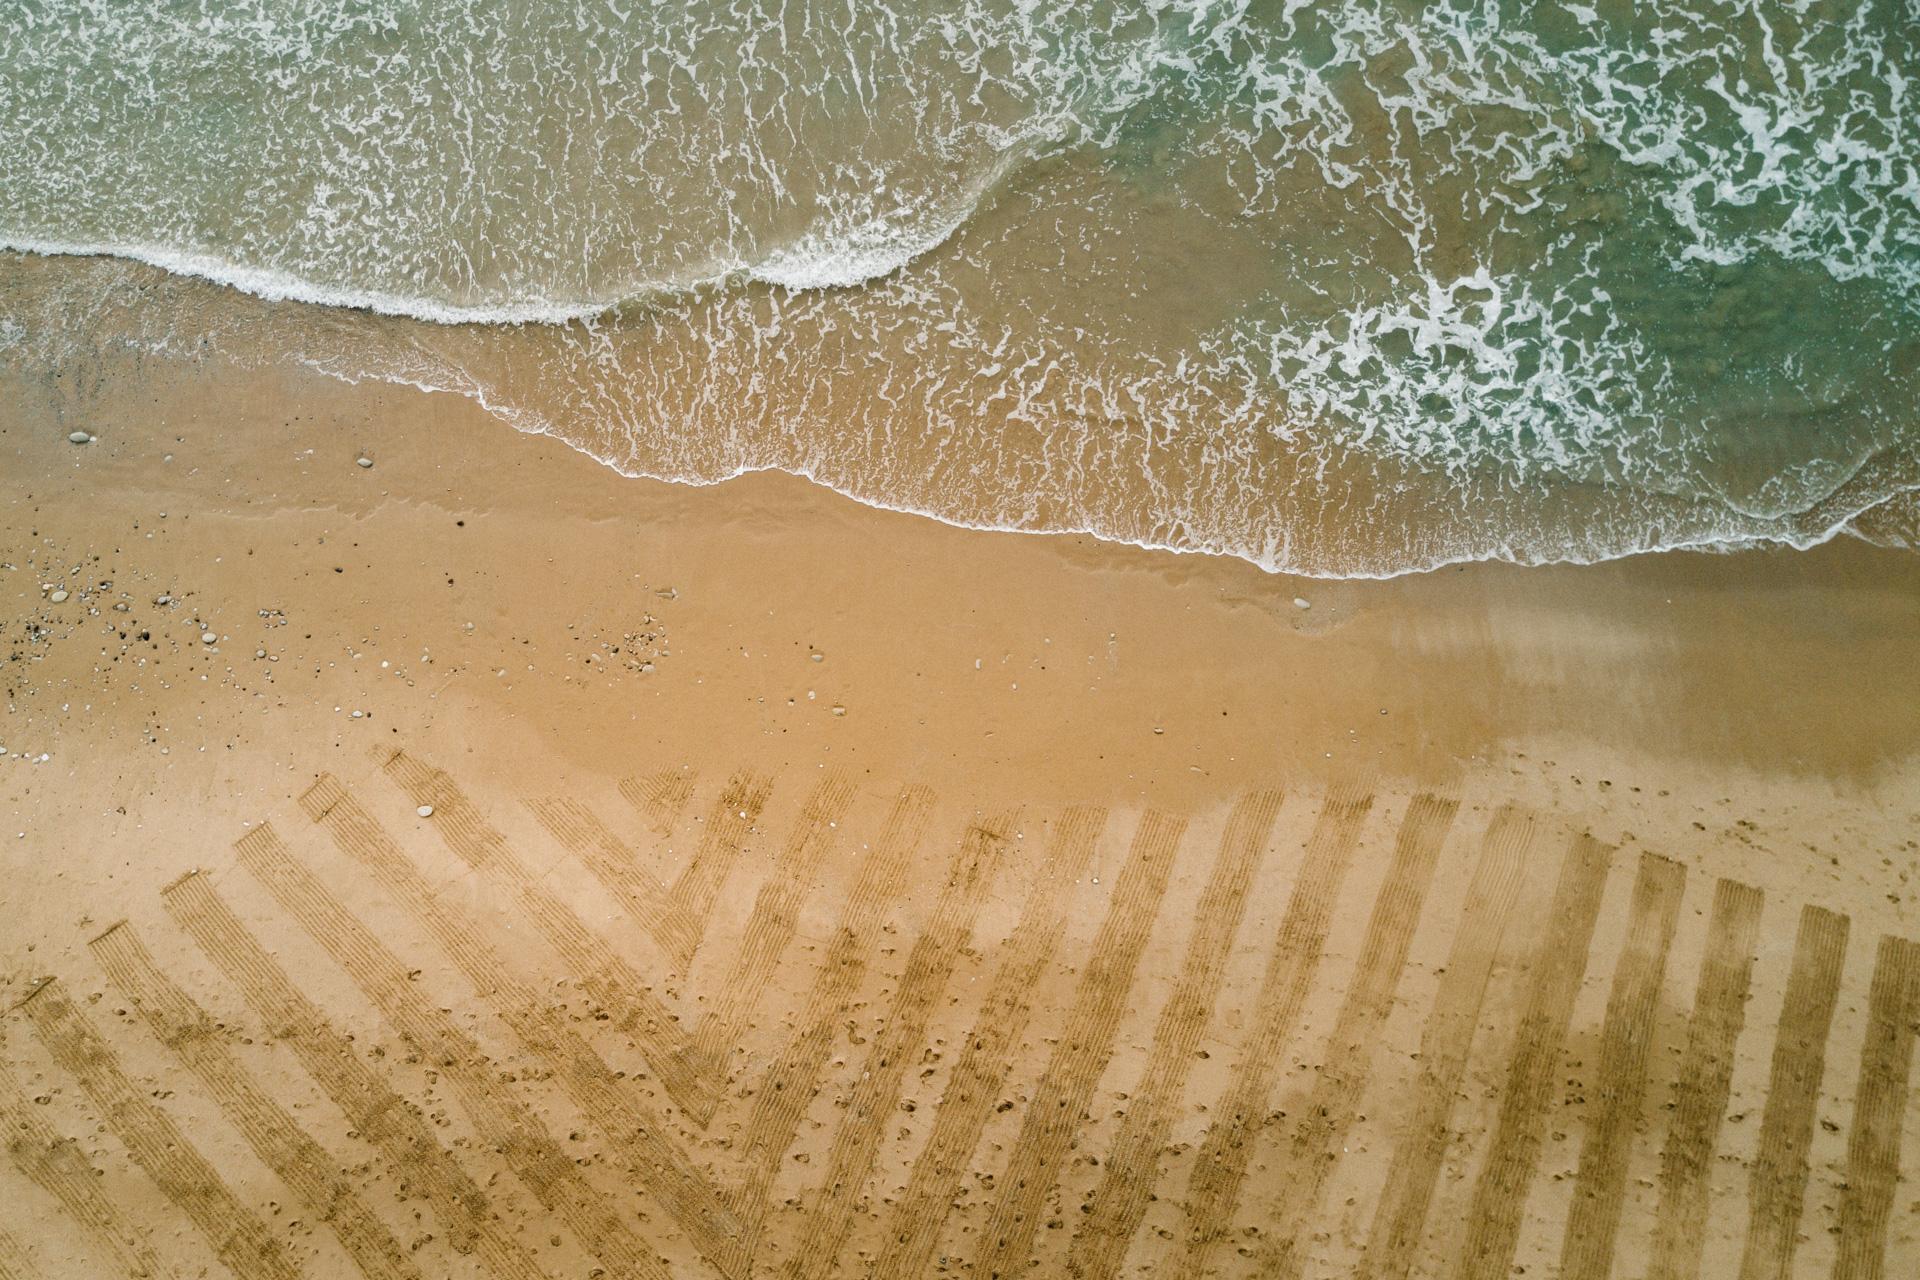 Damien-dohmen-sand-print-lx-one-32